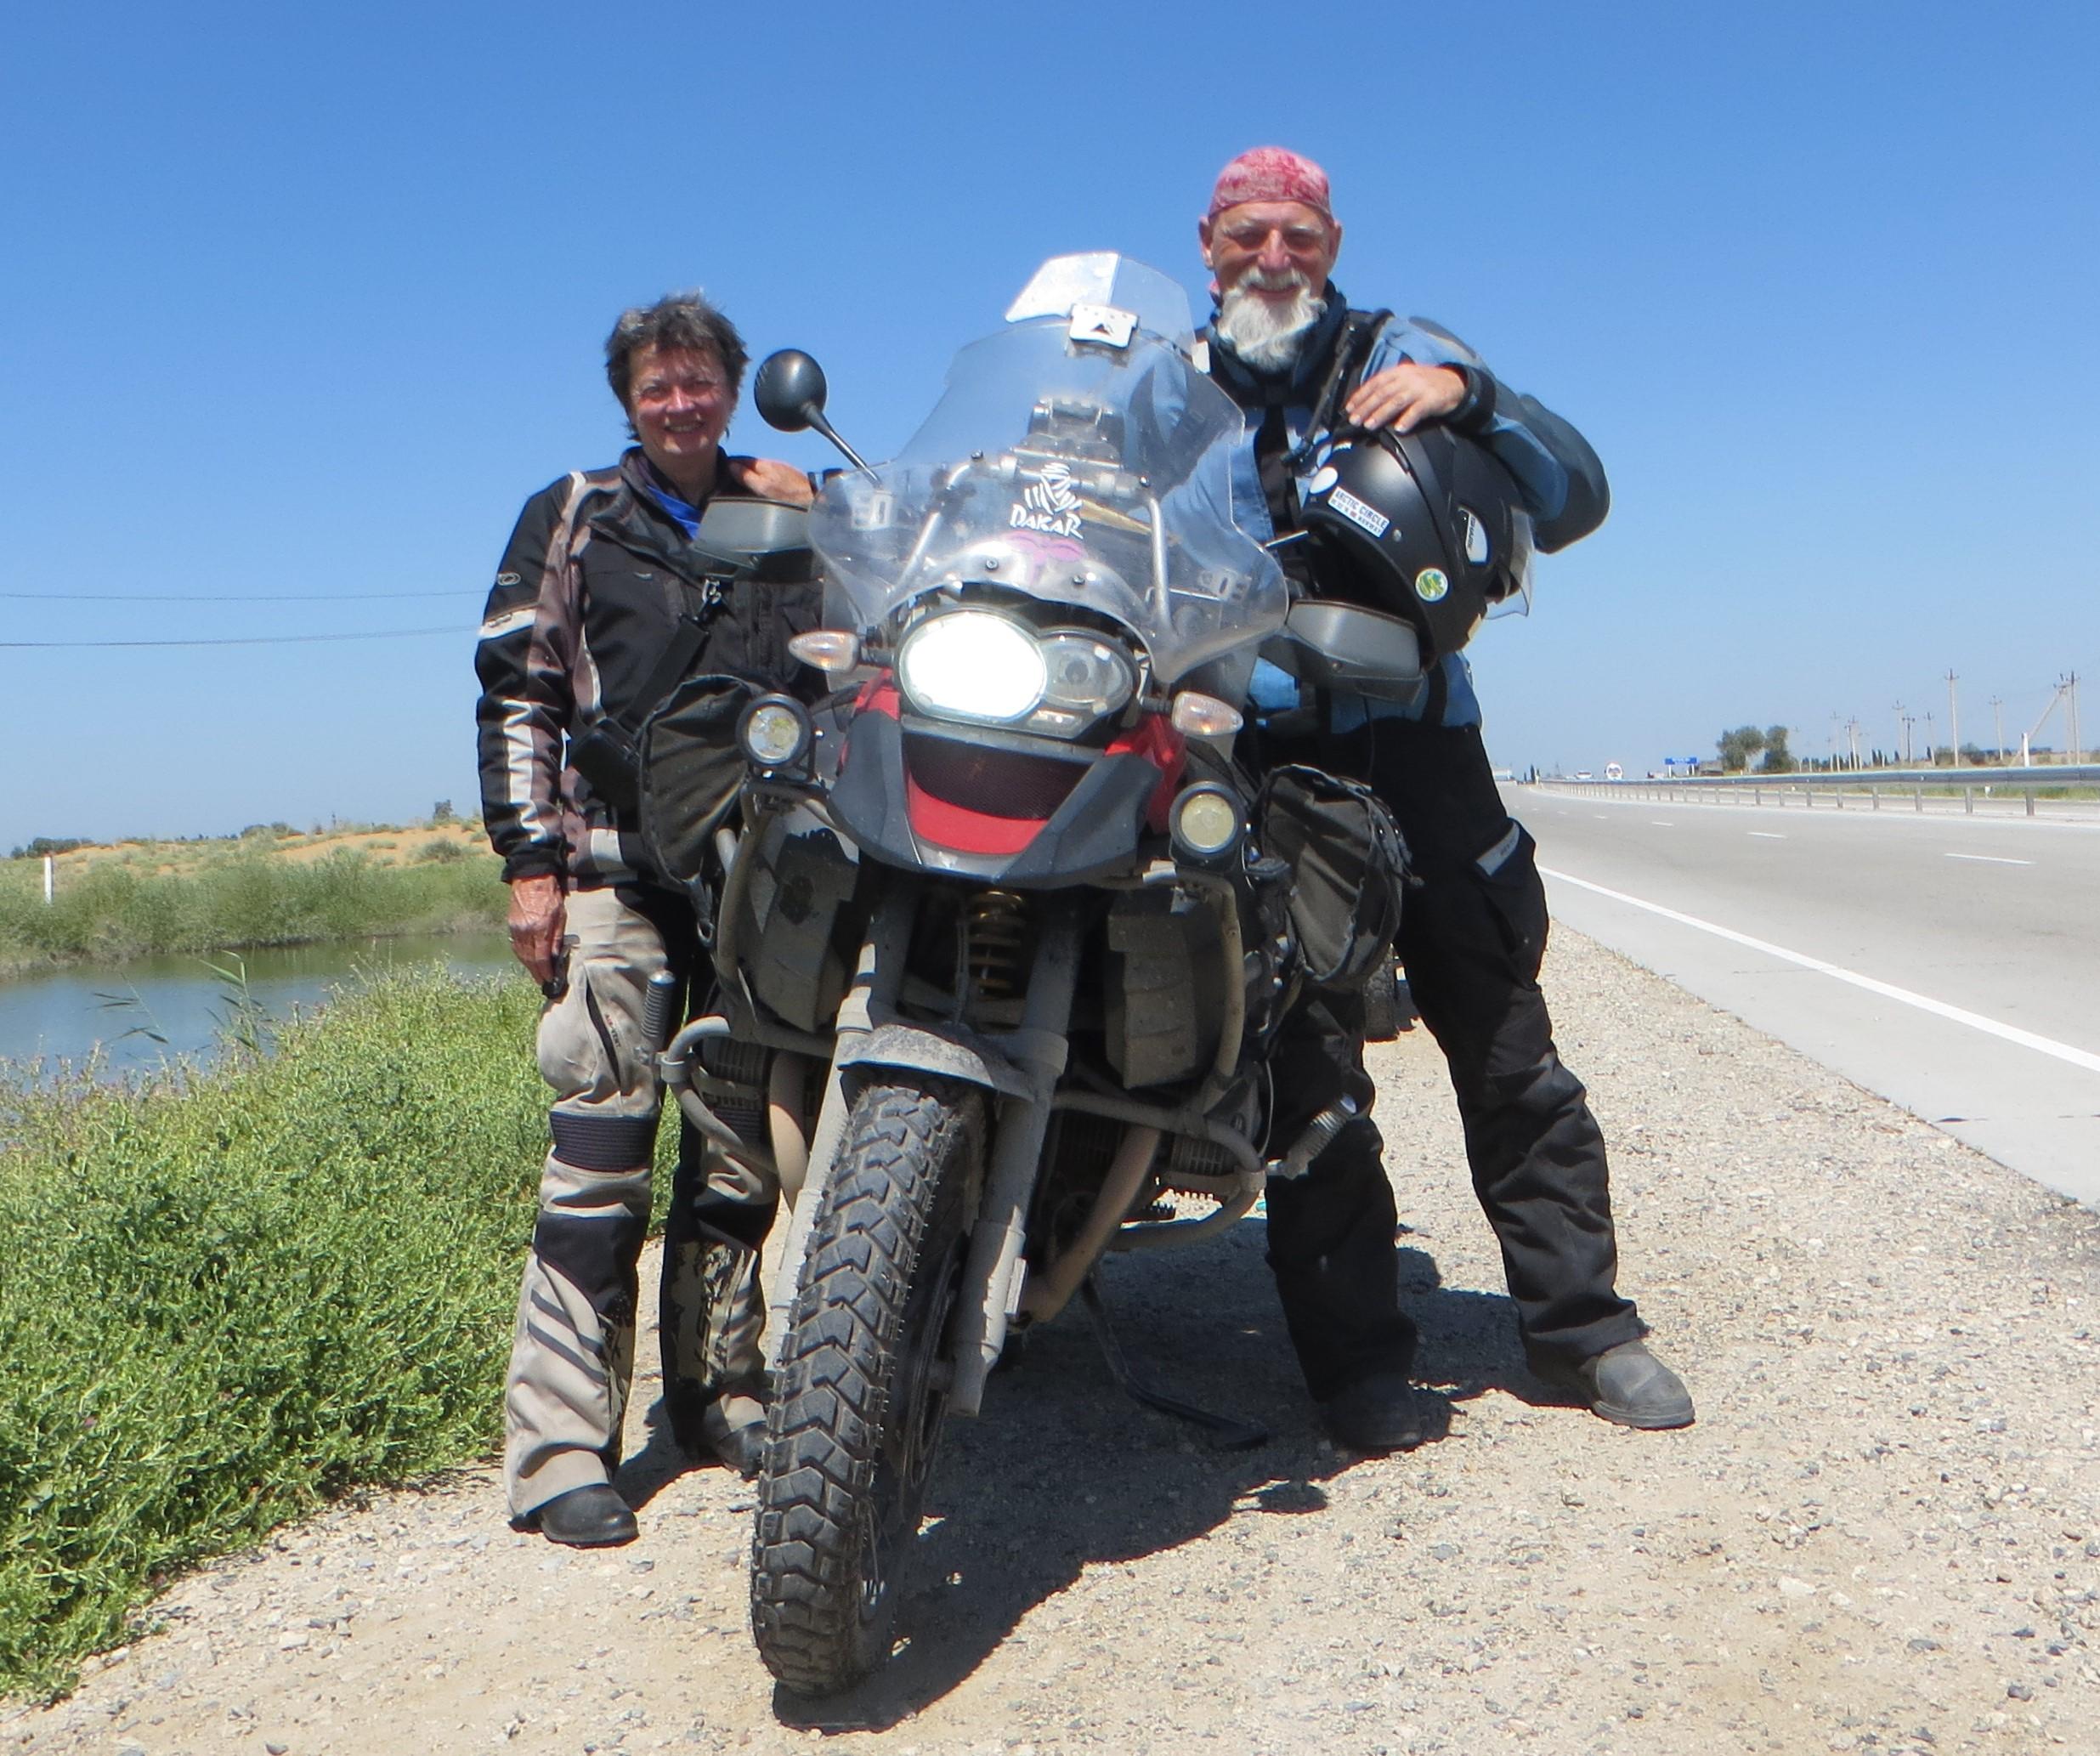 Shirley Hardy-Rix & Brian Rix | Aussies Overland | Uzbekistan - 200,000 between Khiva and Bukhara